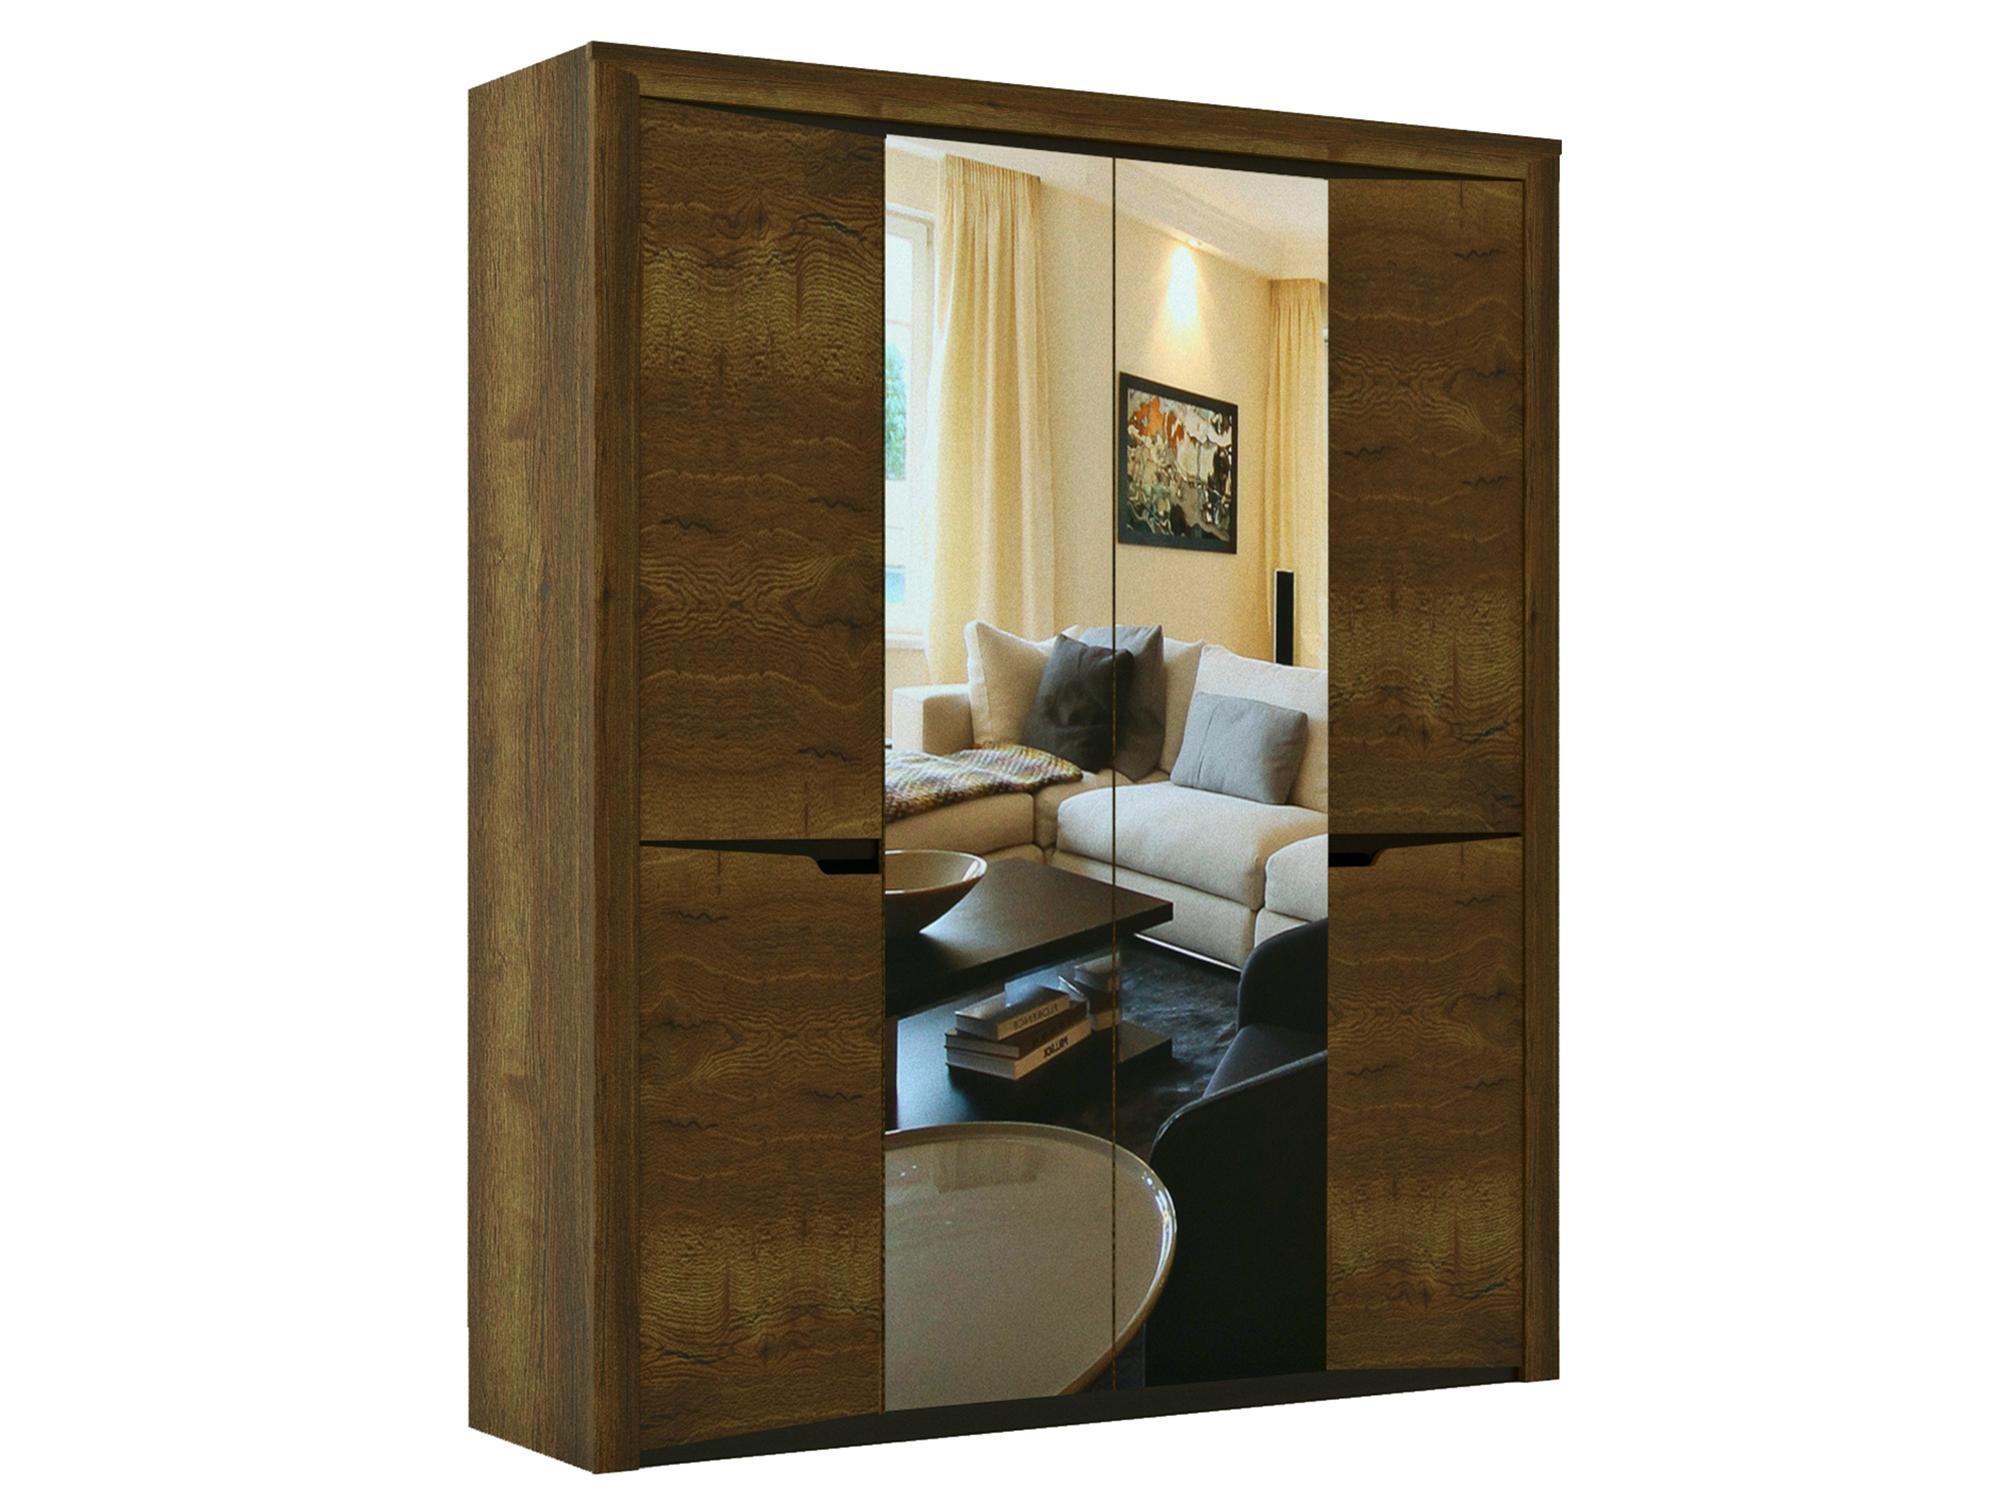 Шкаф 4-х дверный Гарда Дуб галифакс табак, Коричневый, Коричневый